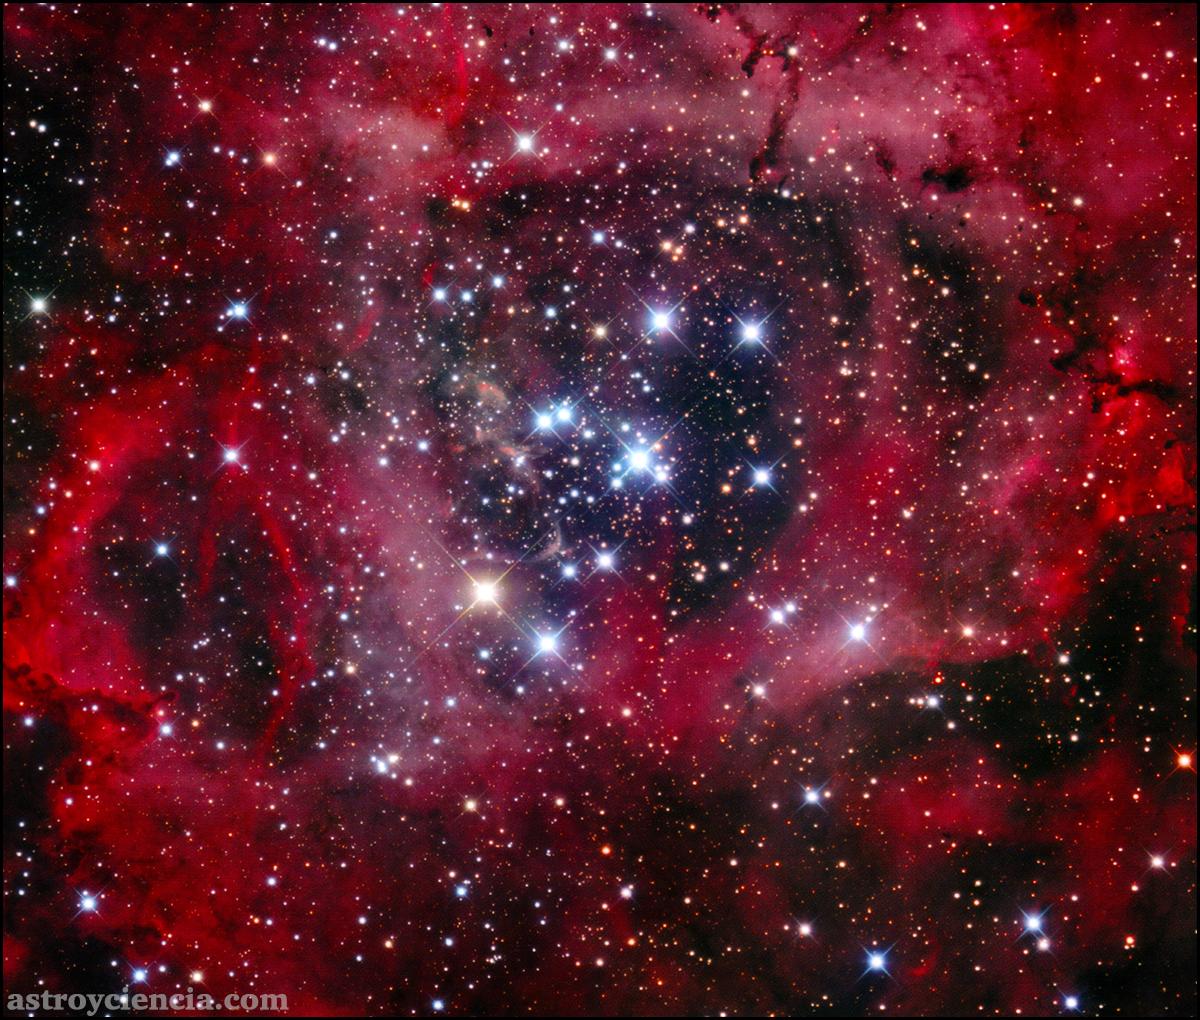 Nebulosa Roseton